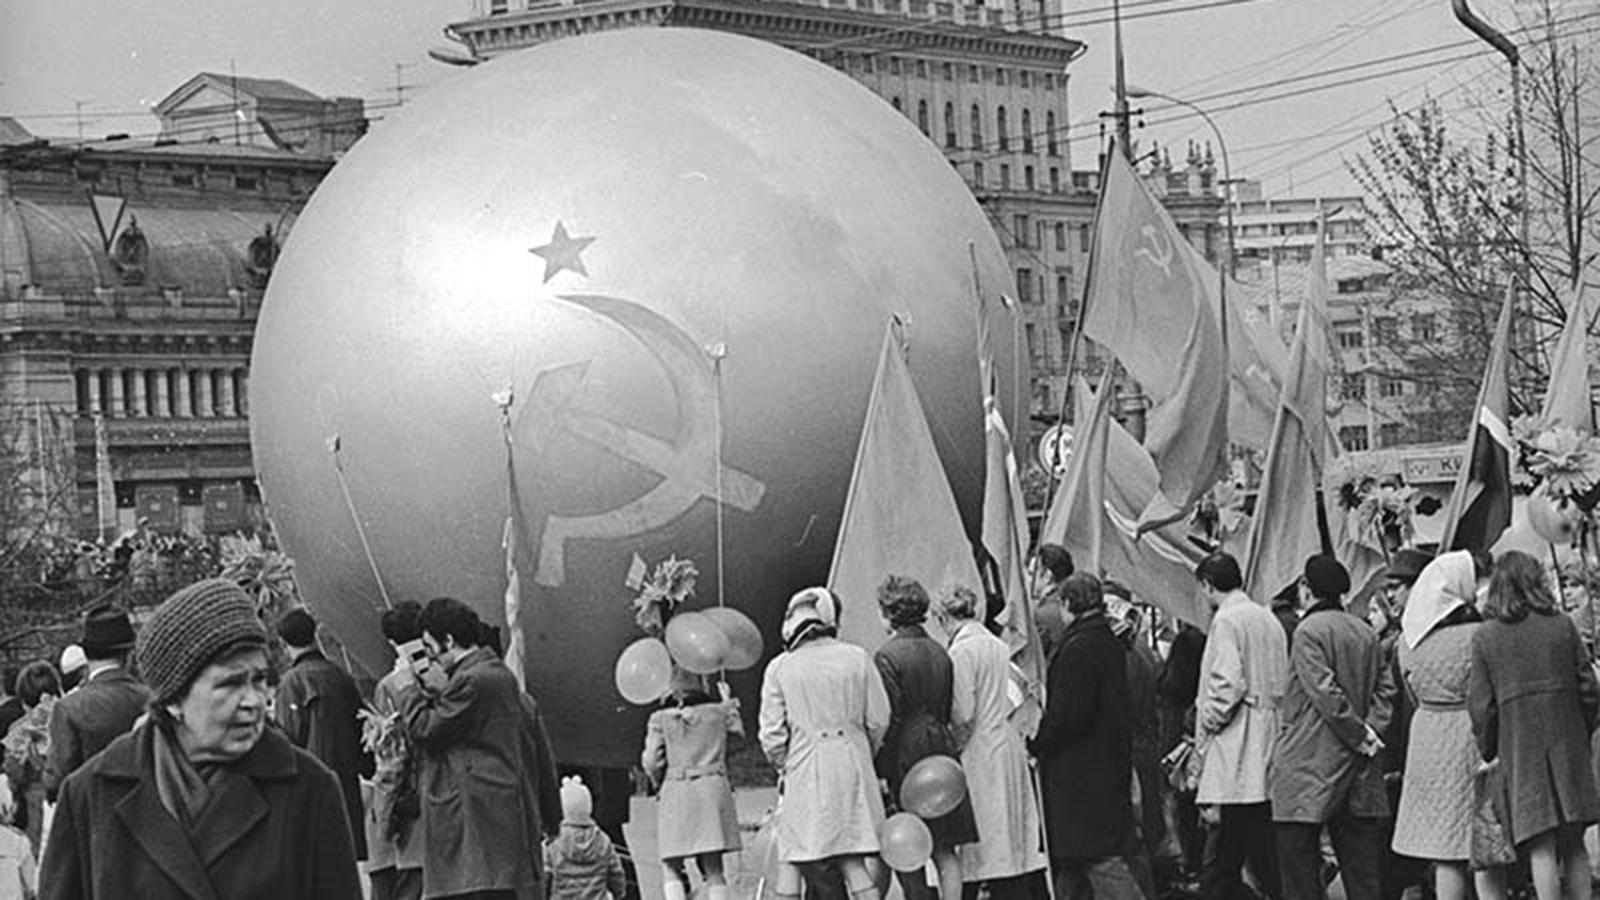 1971 год. XXIV съезд партии. Cтрана вступила в стадию развитого социализма